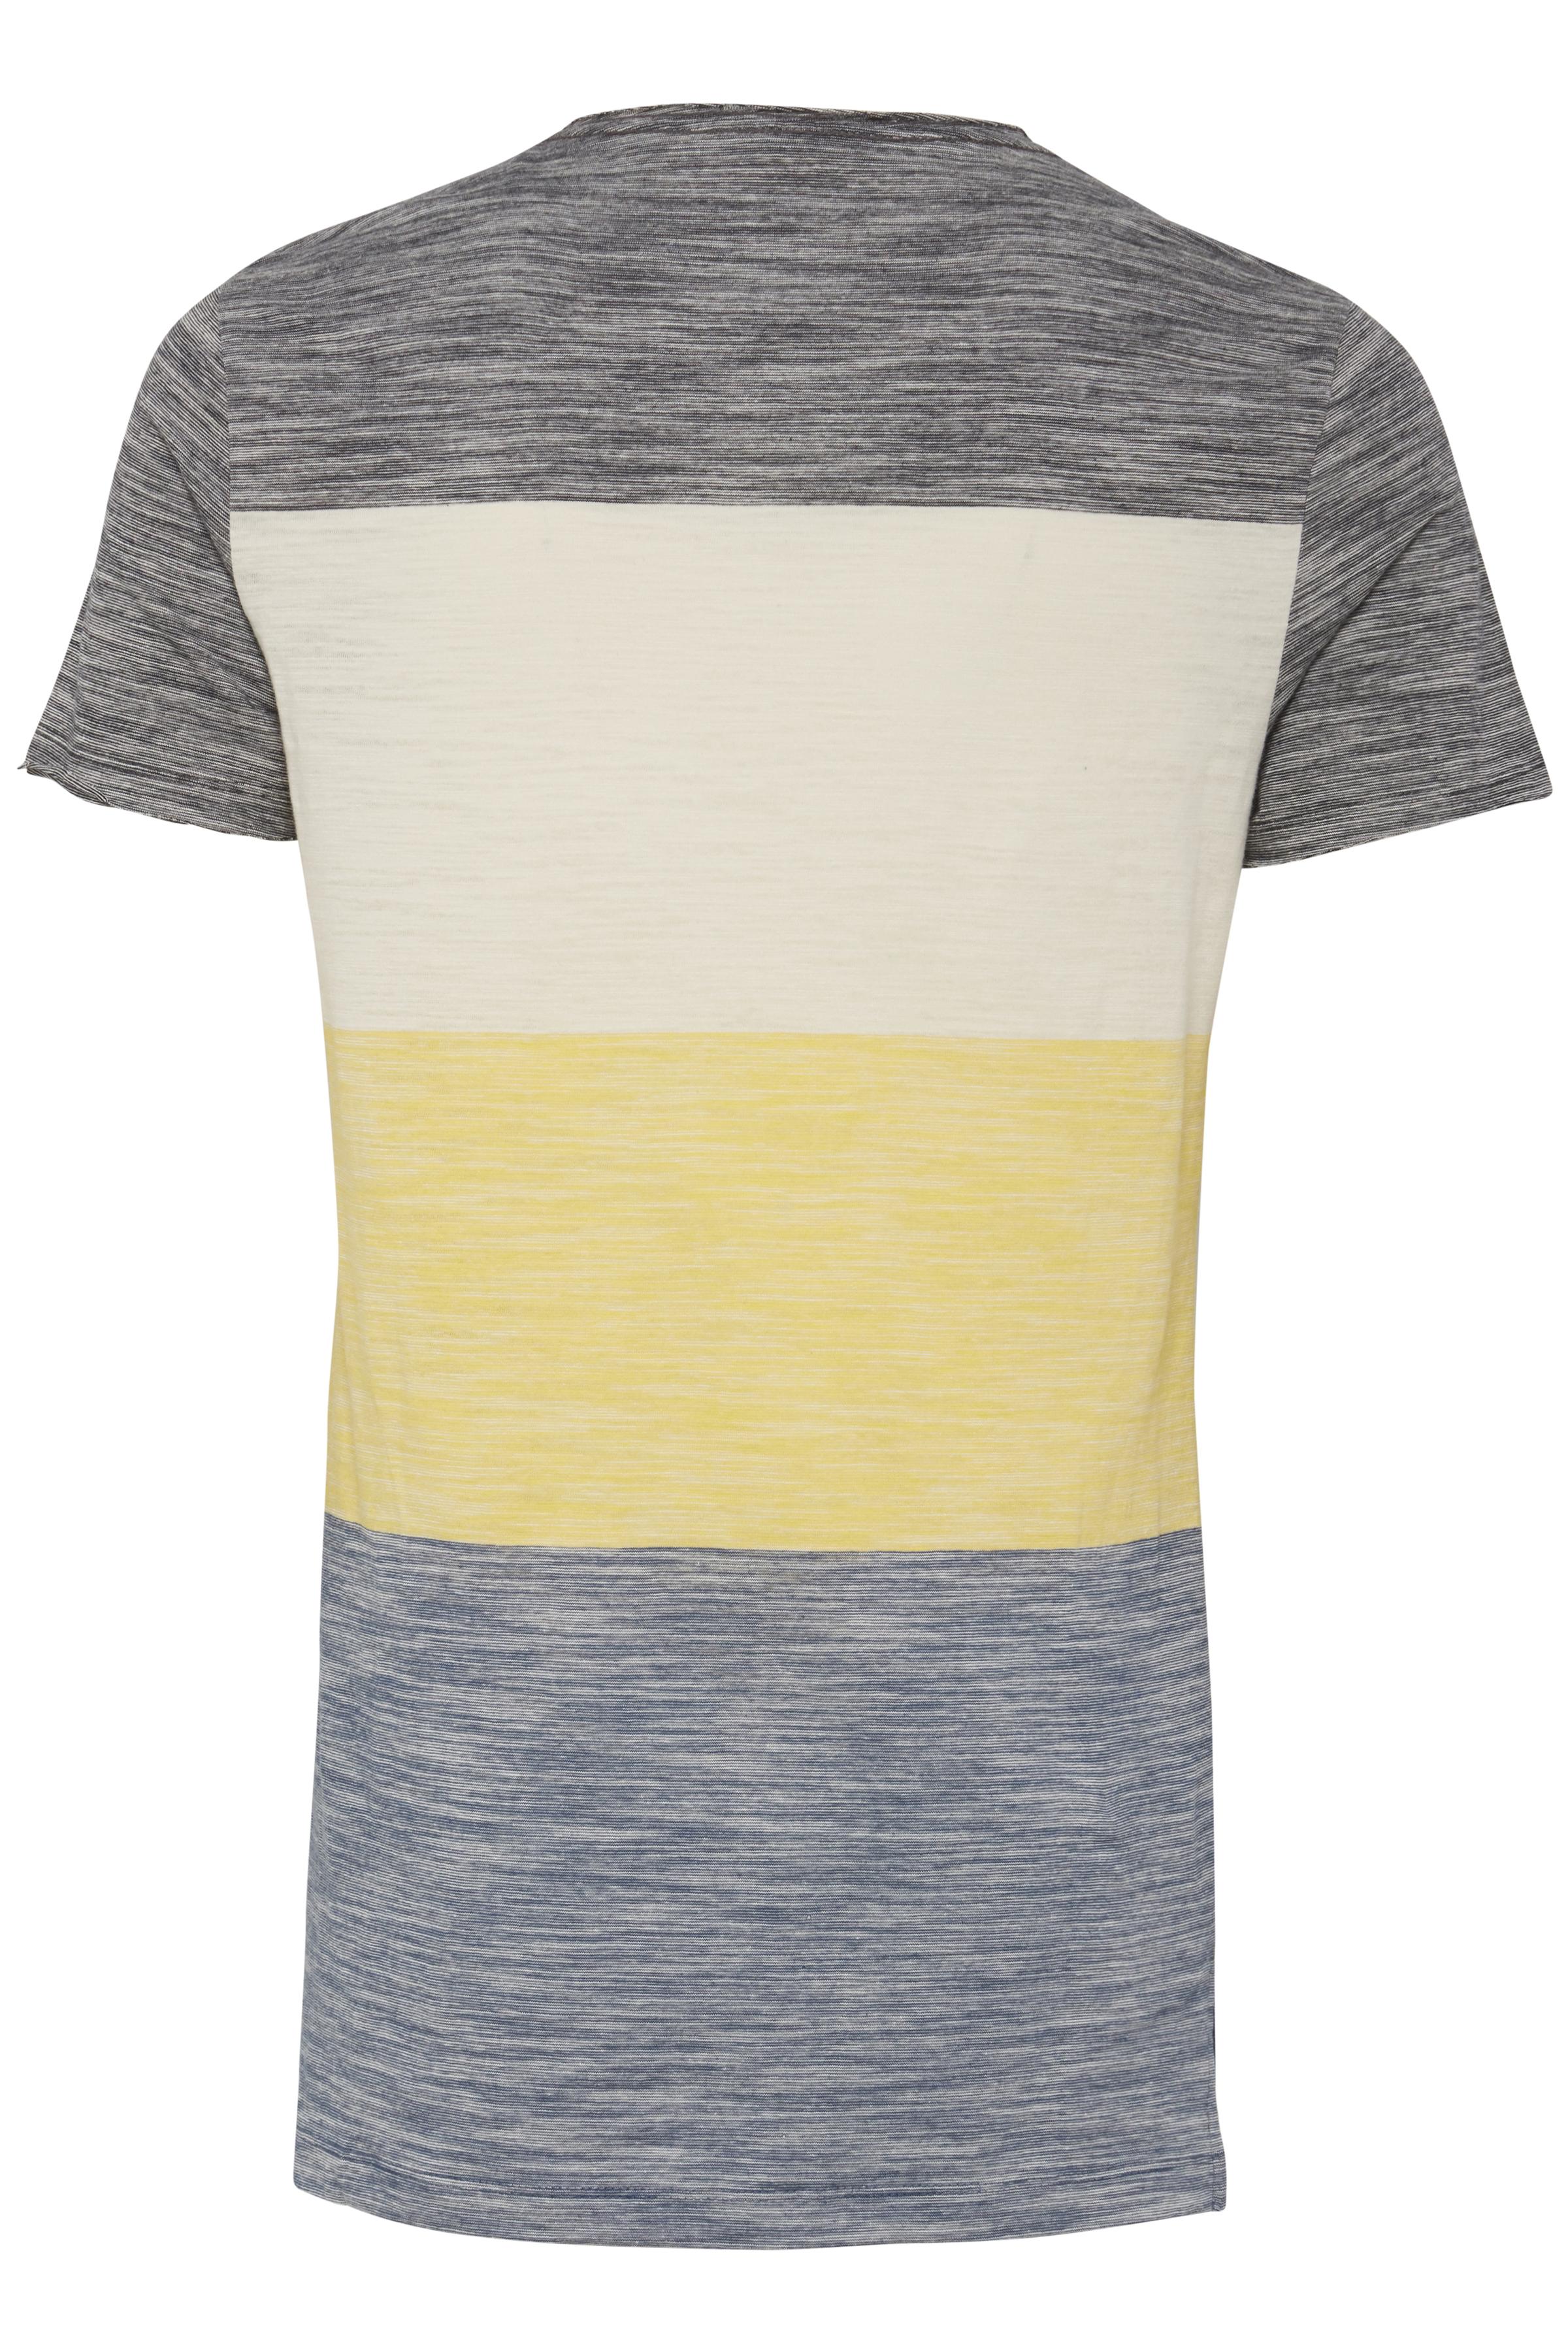 Dark Navy Blue T-shirt fra Blend He – Køb Dark Navy Blue T-shirt fra str. S-XXL her